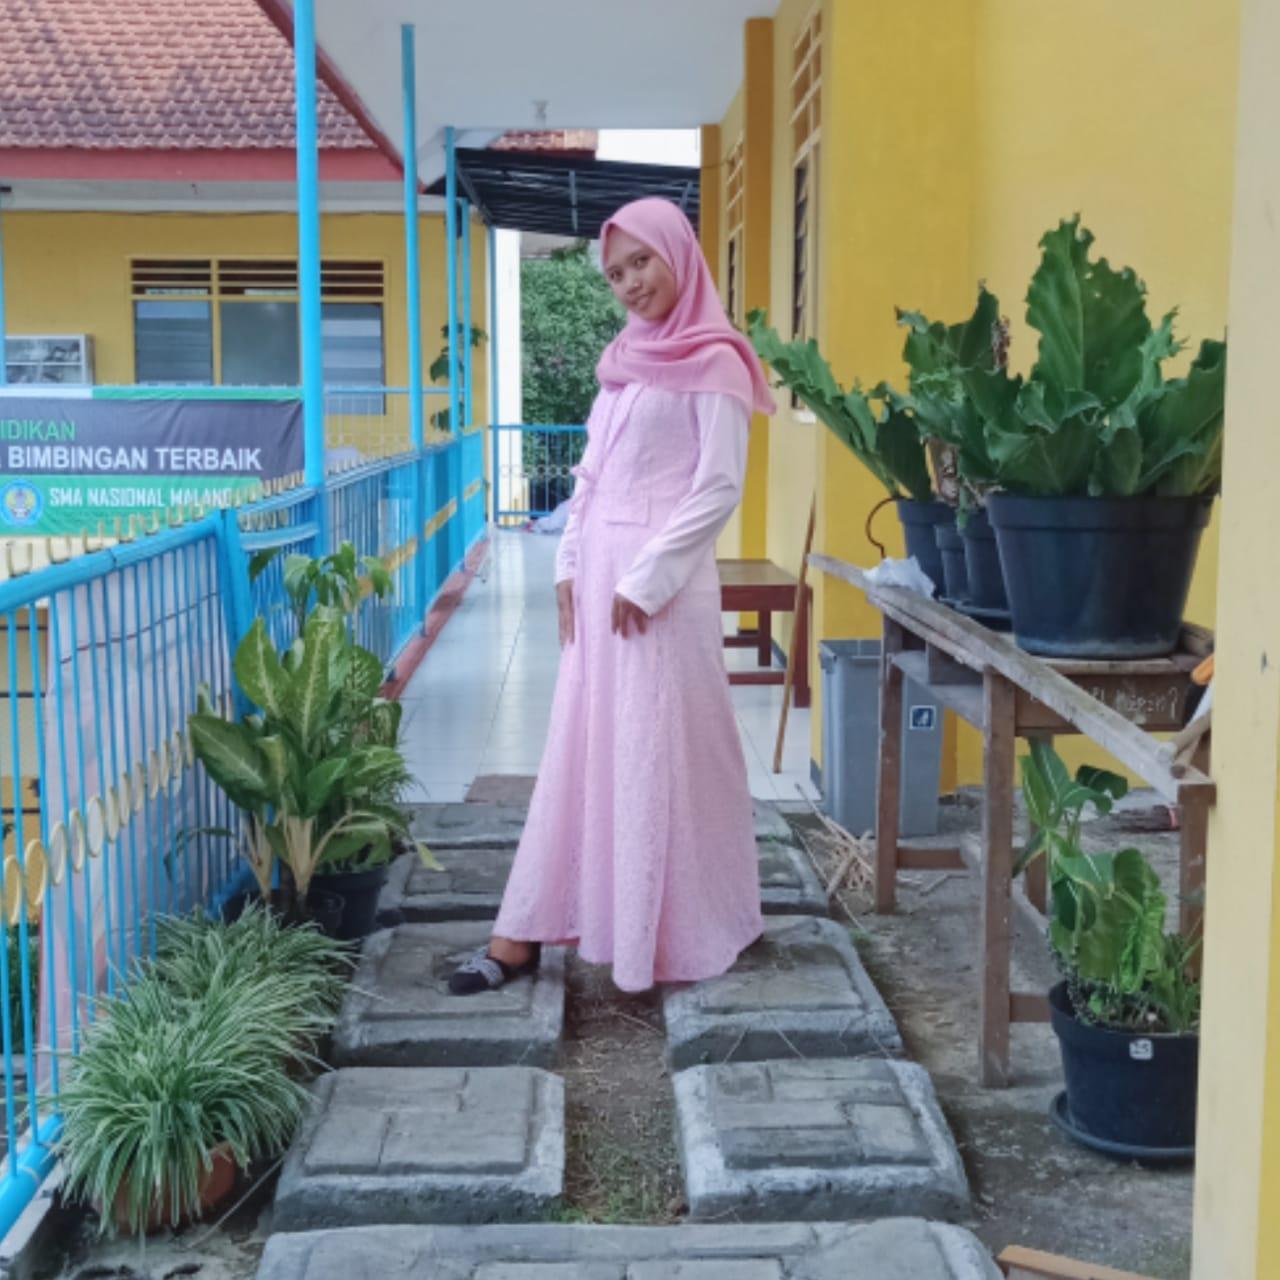 Khusnul Fatimatul Zahro